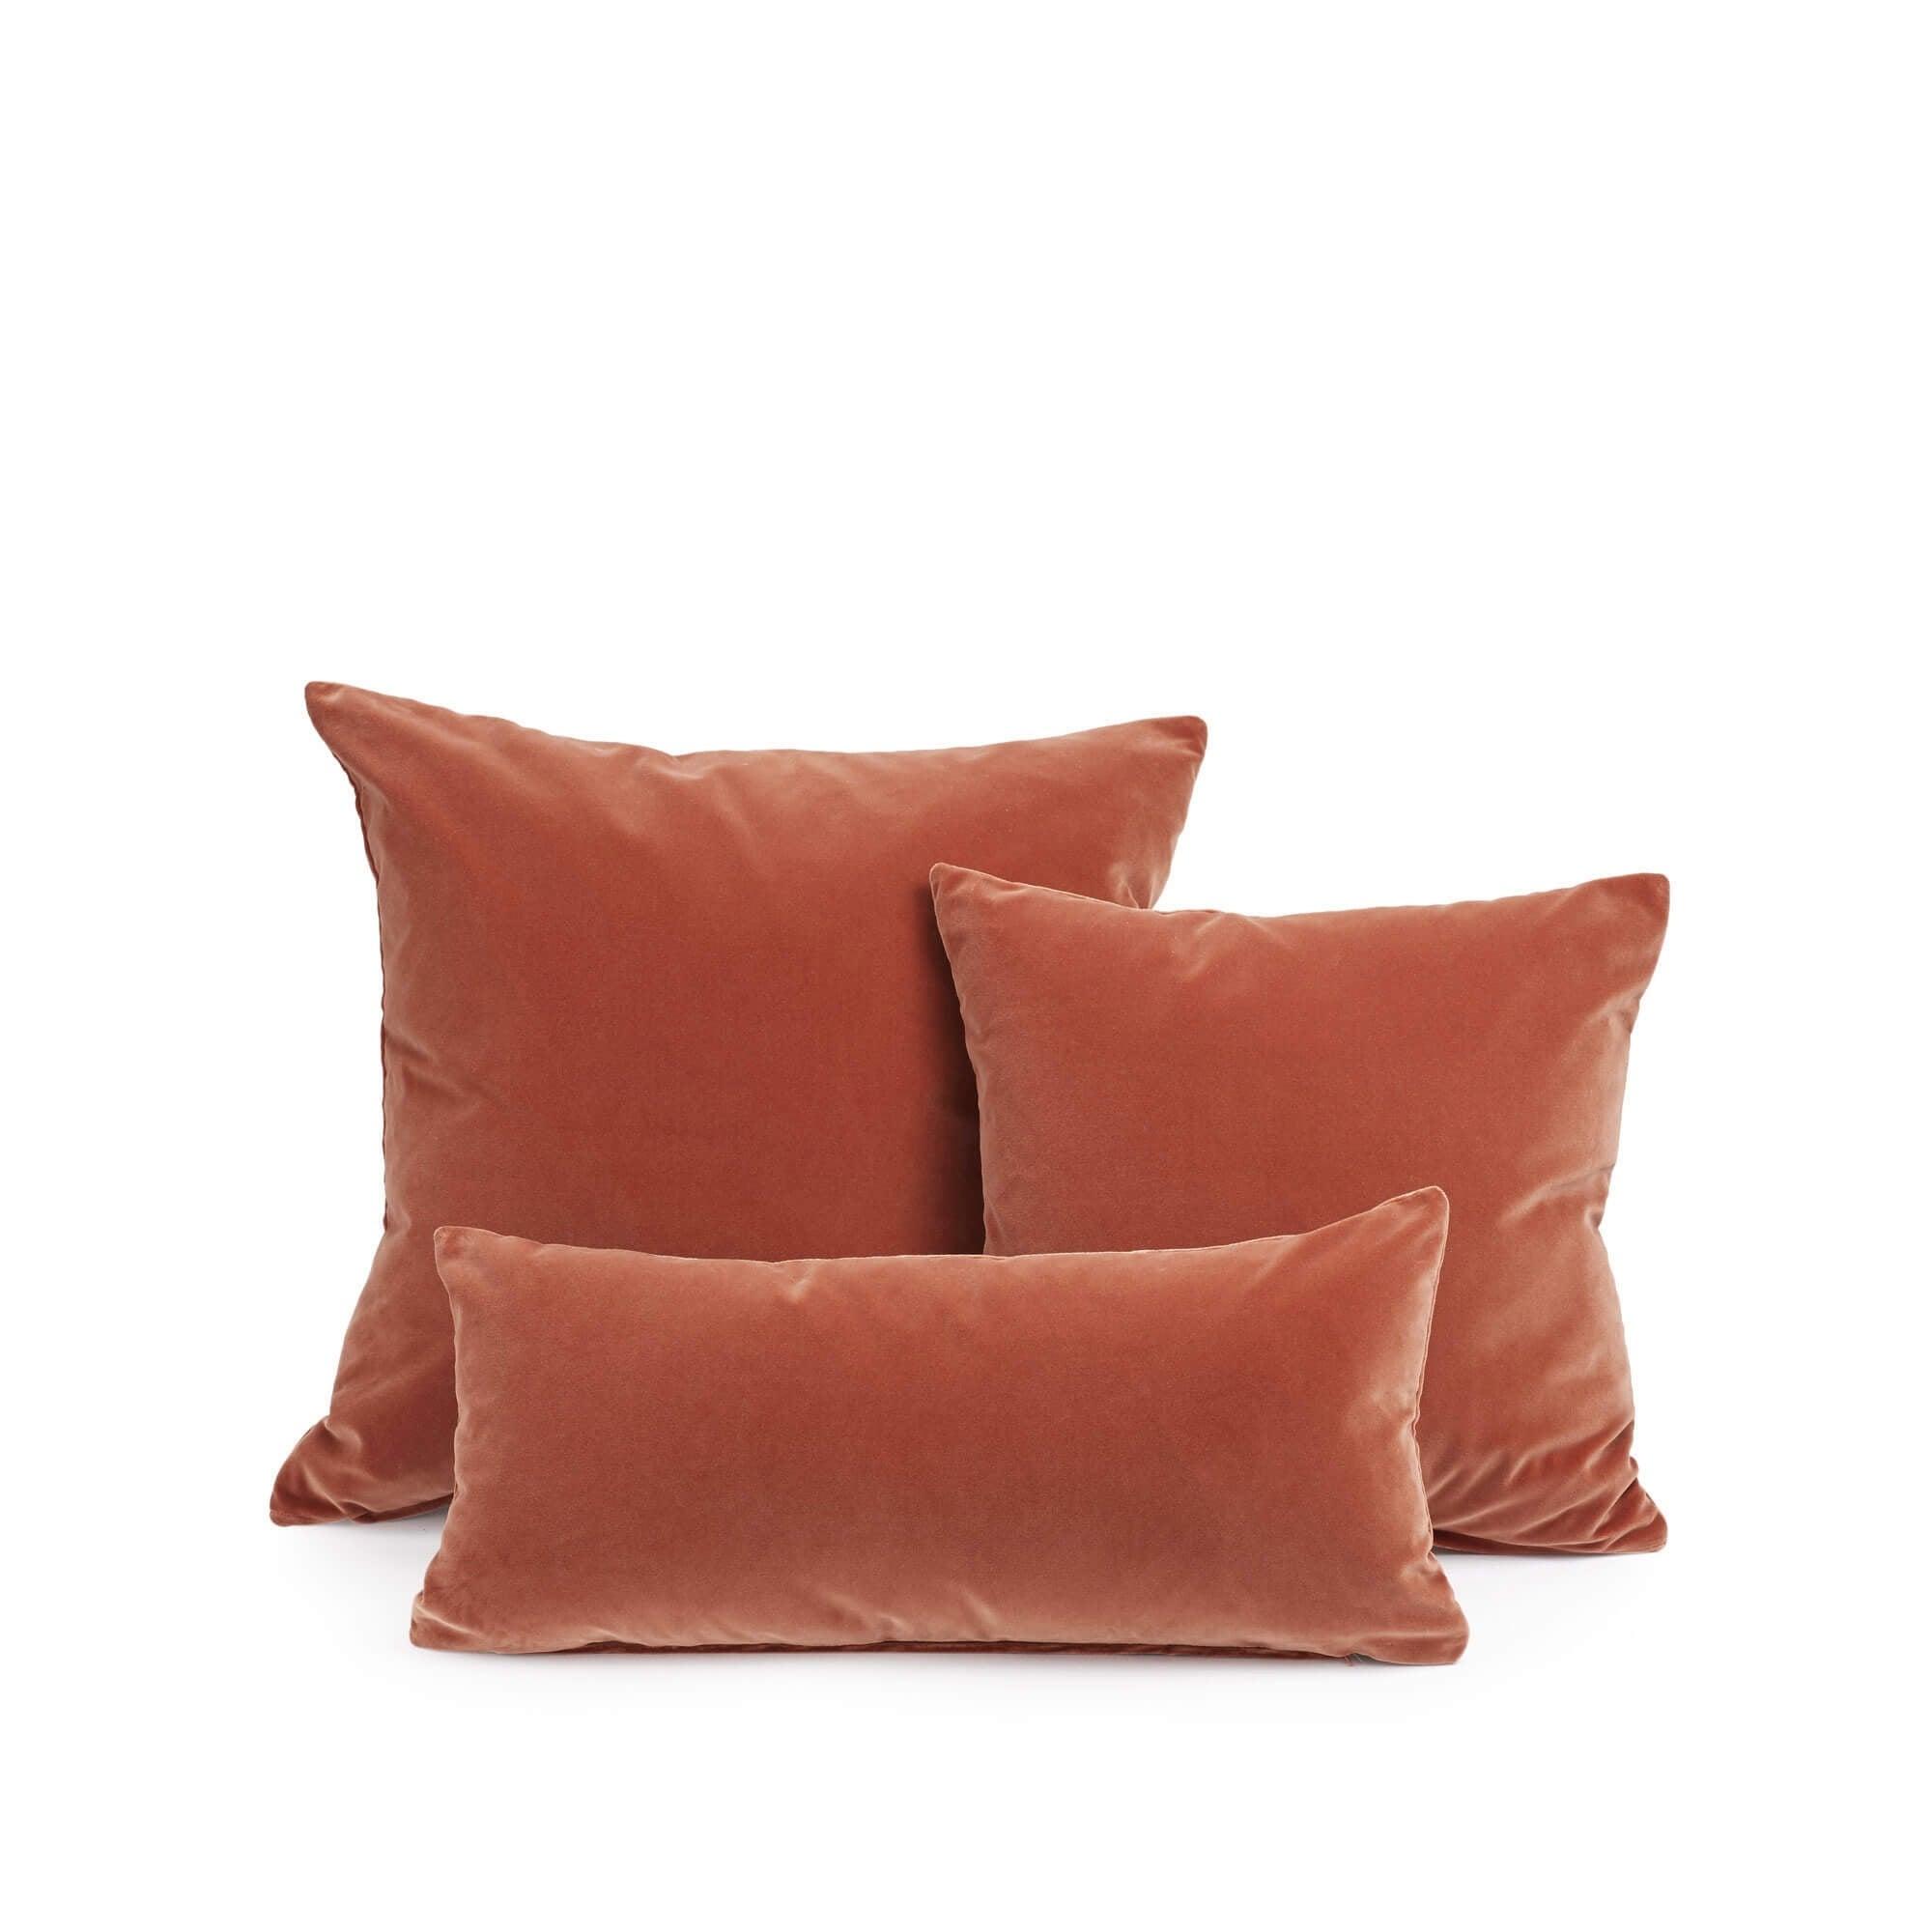 monroe-cushion-group_rust_1_1